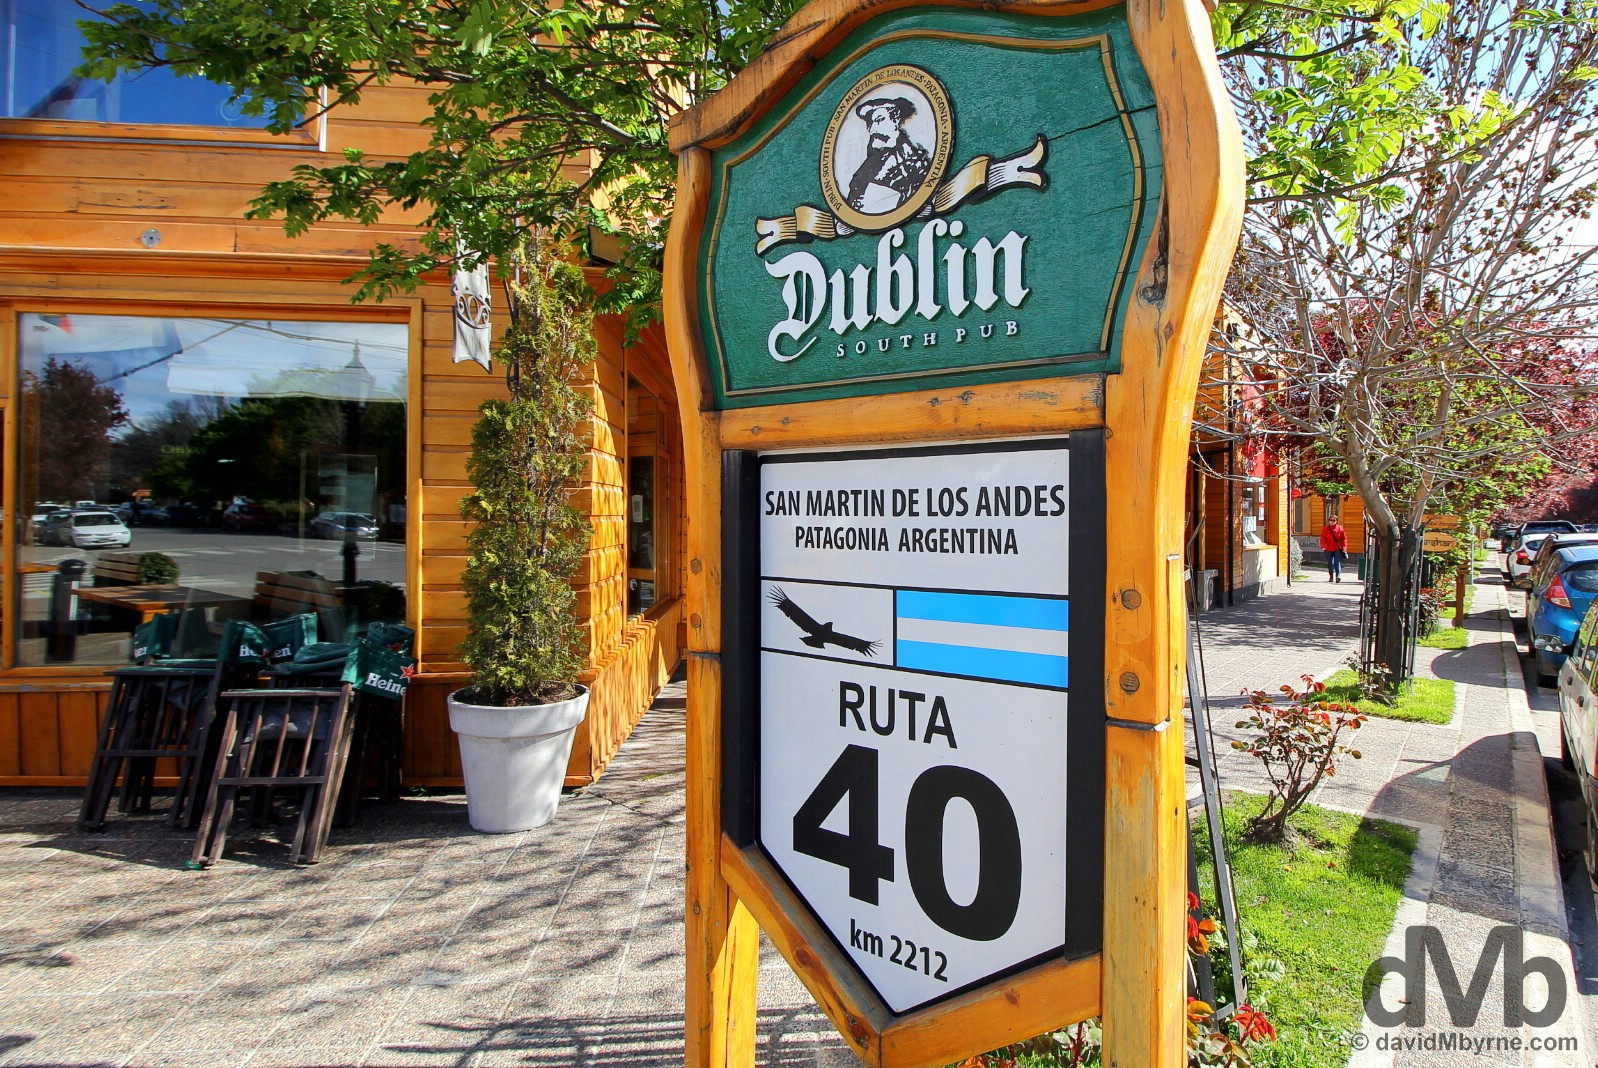 Kilometre 2212 on Ruta 40 in San Martin de los Andes, Patagonia, Argentina. October 14, 2015.